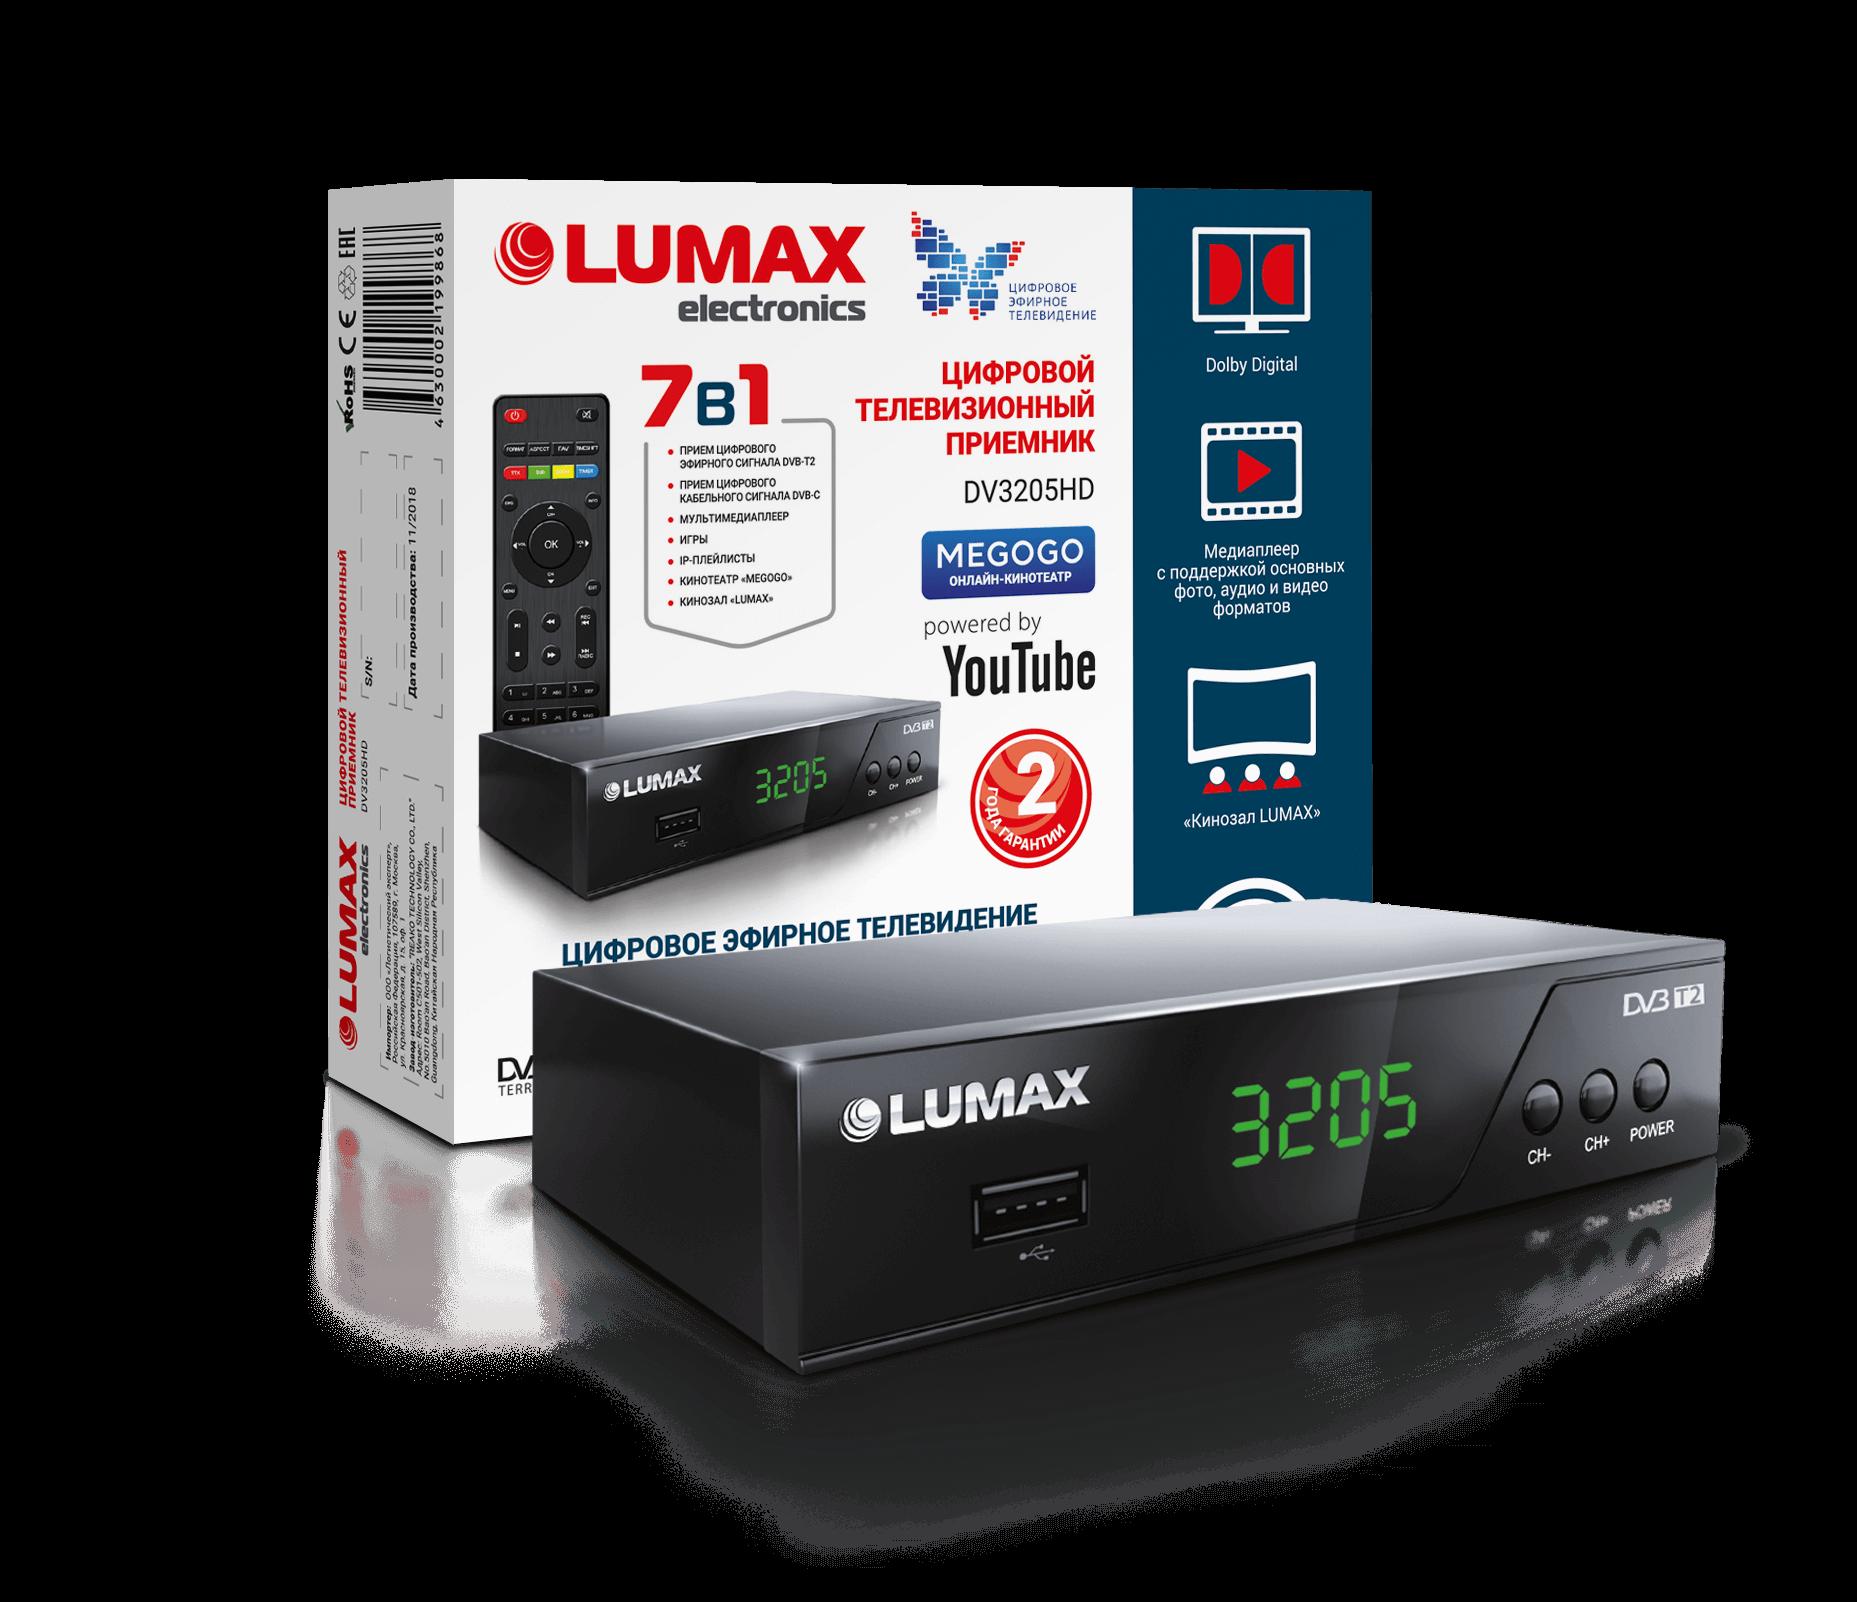 Lumax DV3205HD